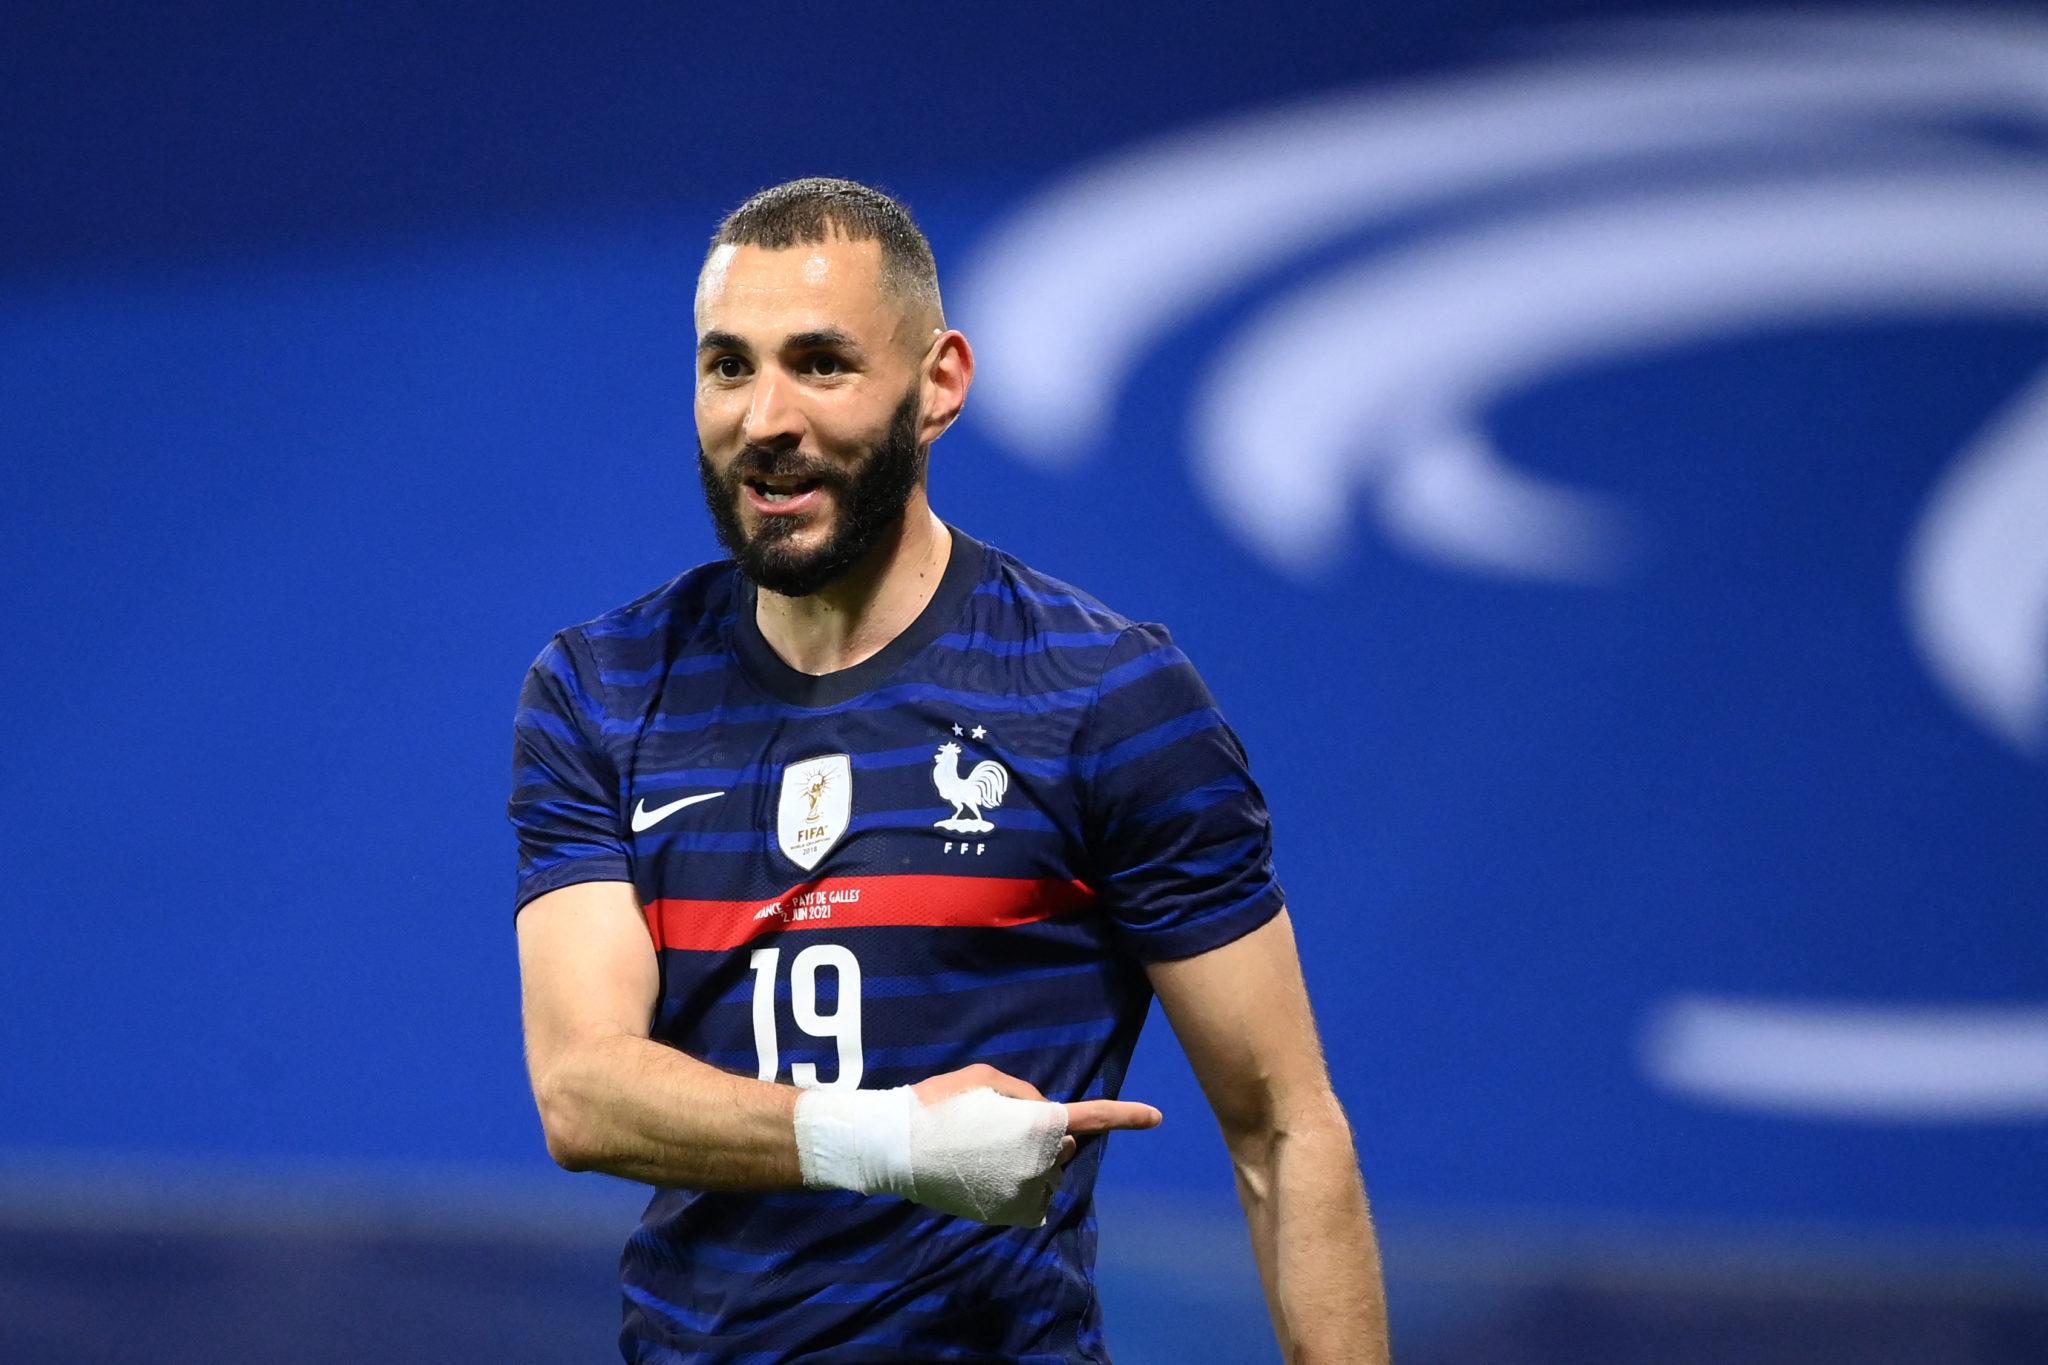 Los Blancos striker Karim Benzema will make his long awaited return to the national team at the EUROS